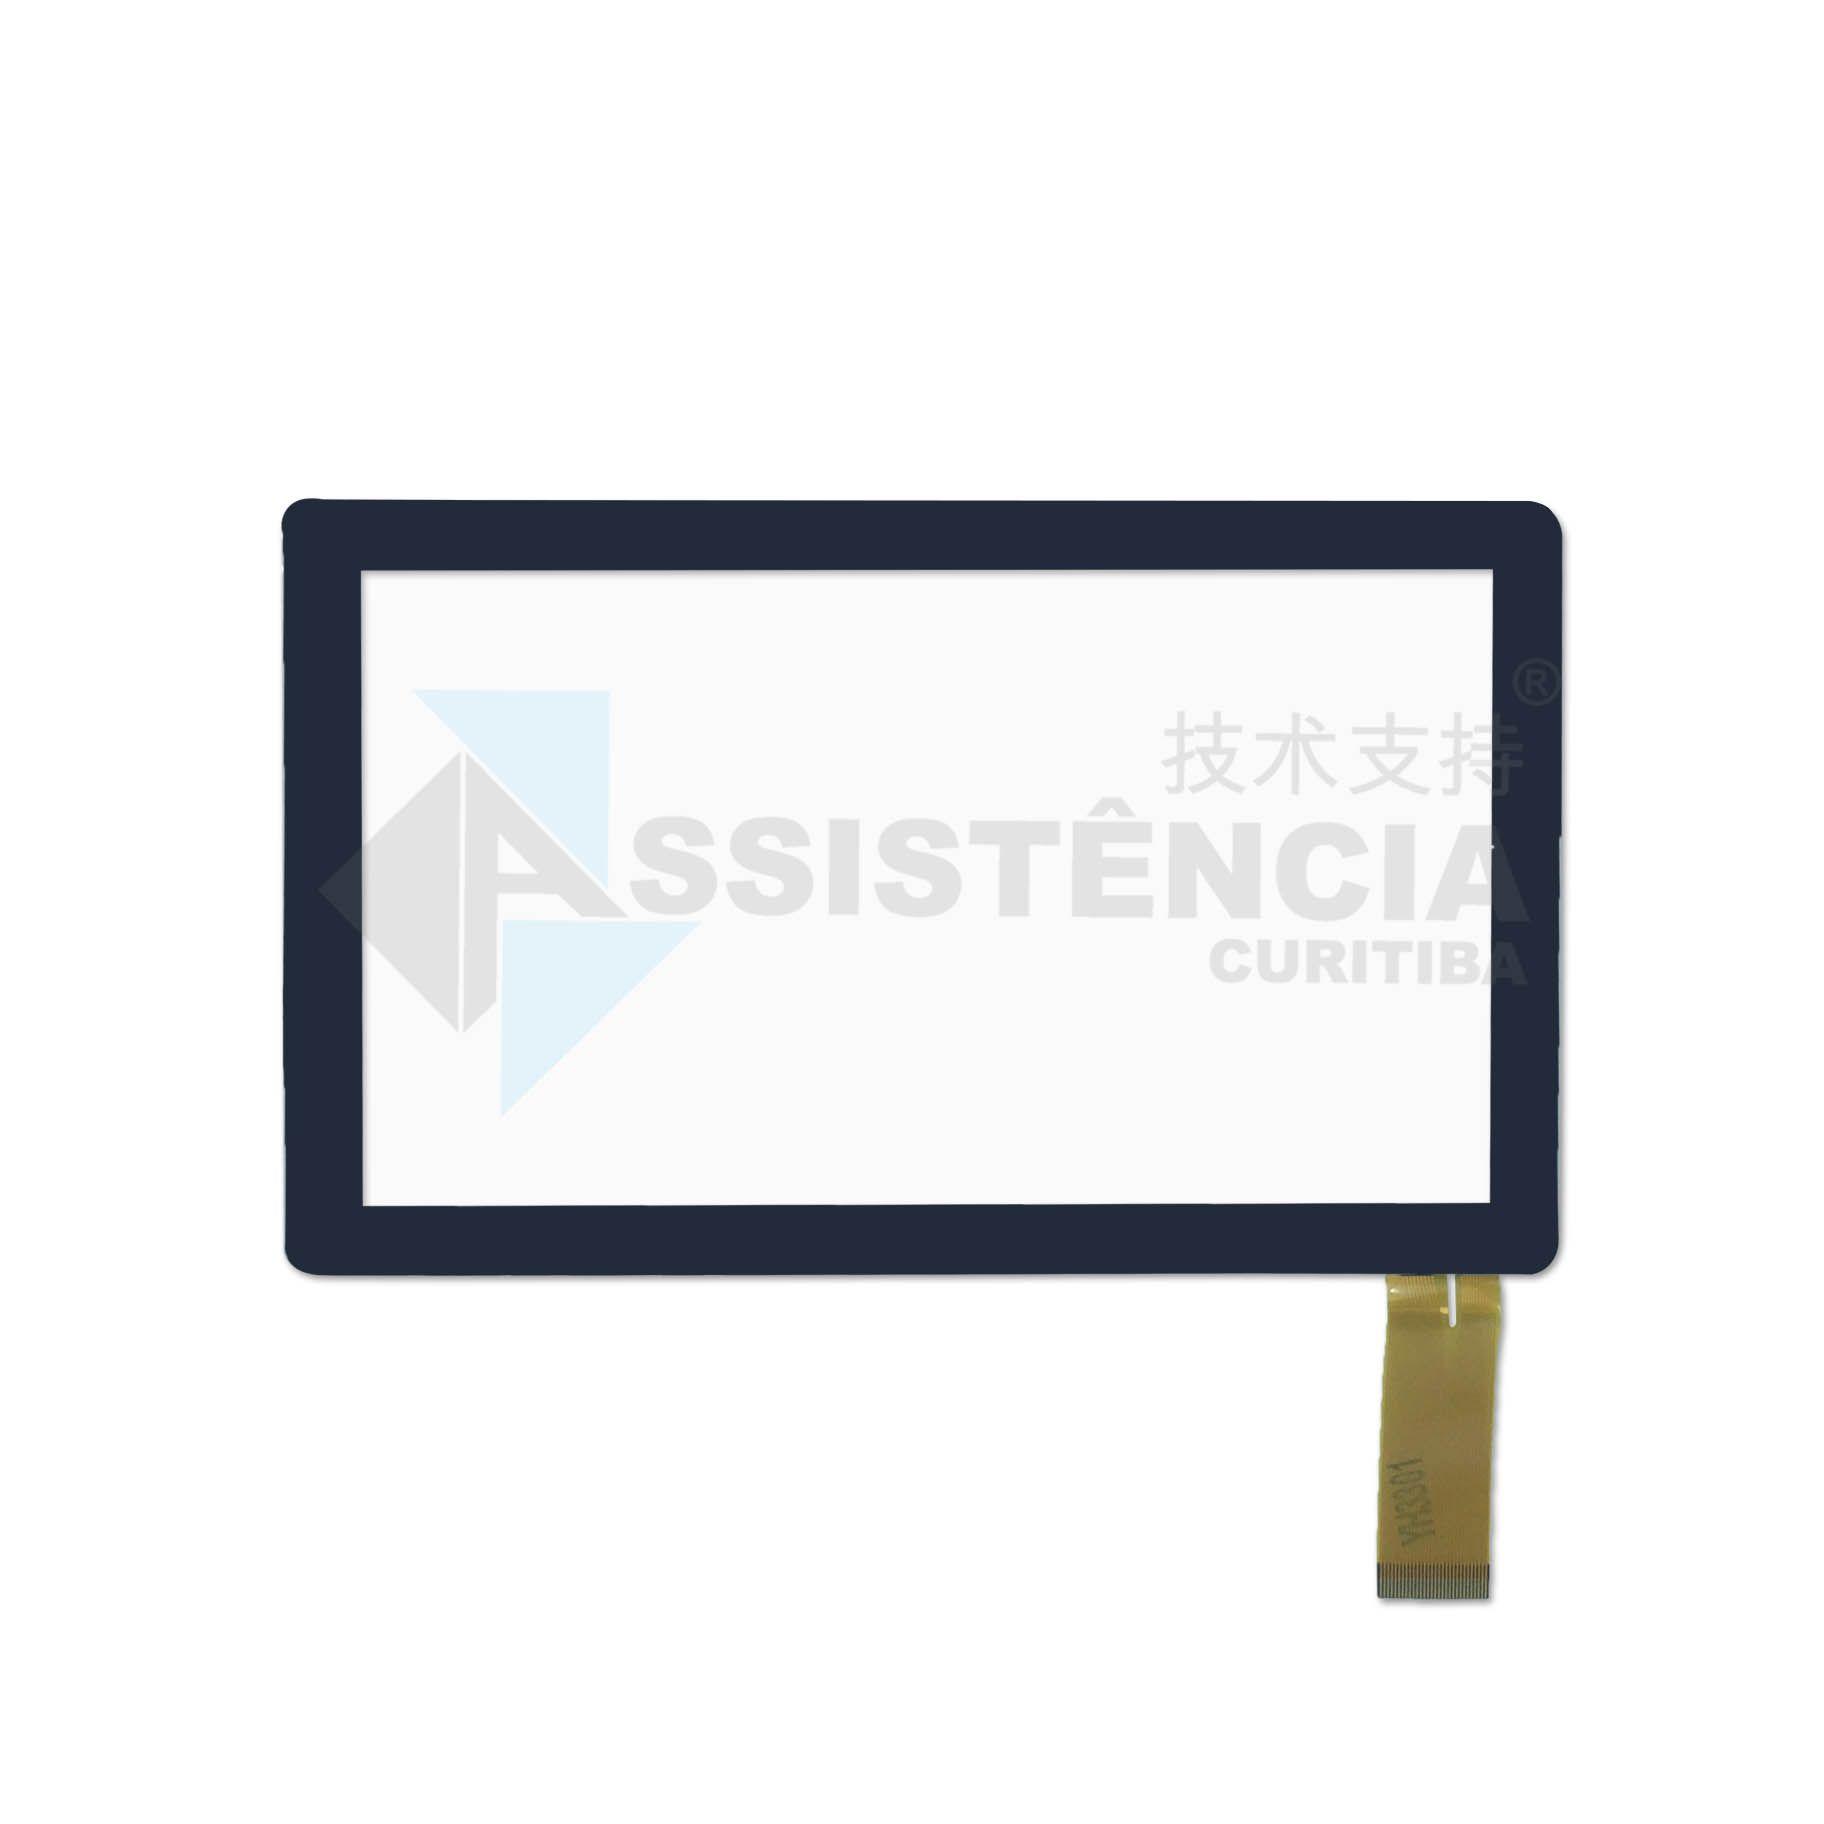 Tela Touch Dotcom CT-7000 CT-7020 Preto